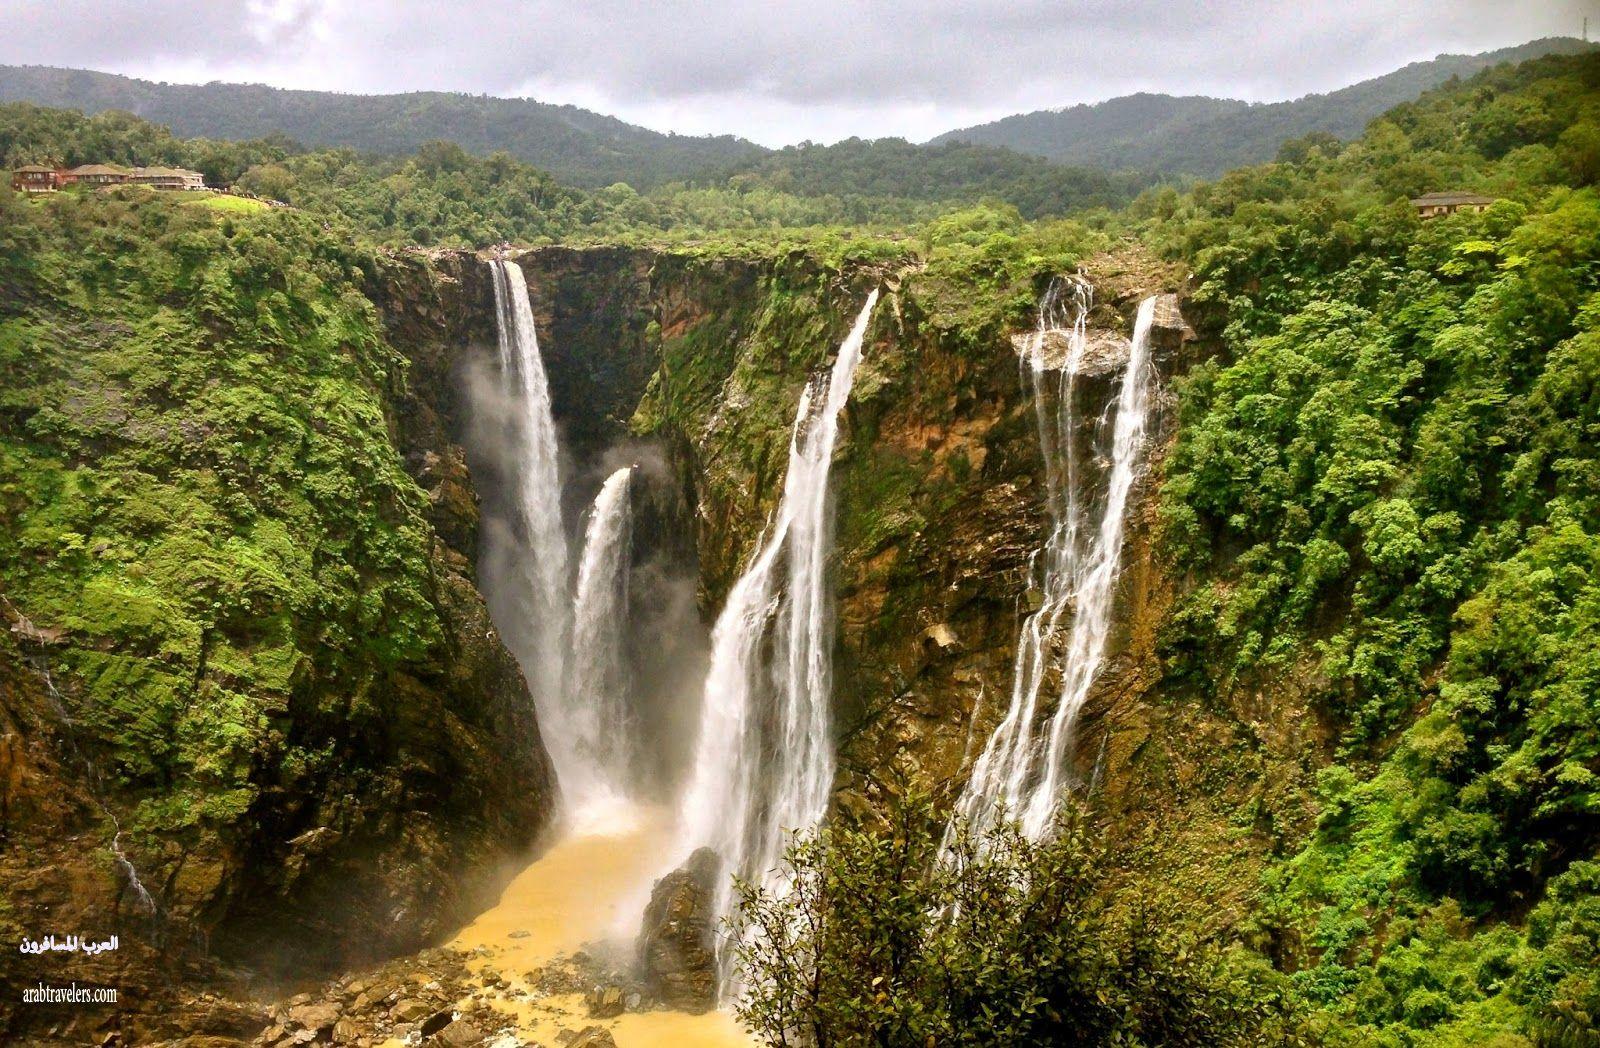 شلالات جوغ Jog Waterfall ( الهند 2015)